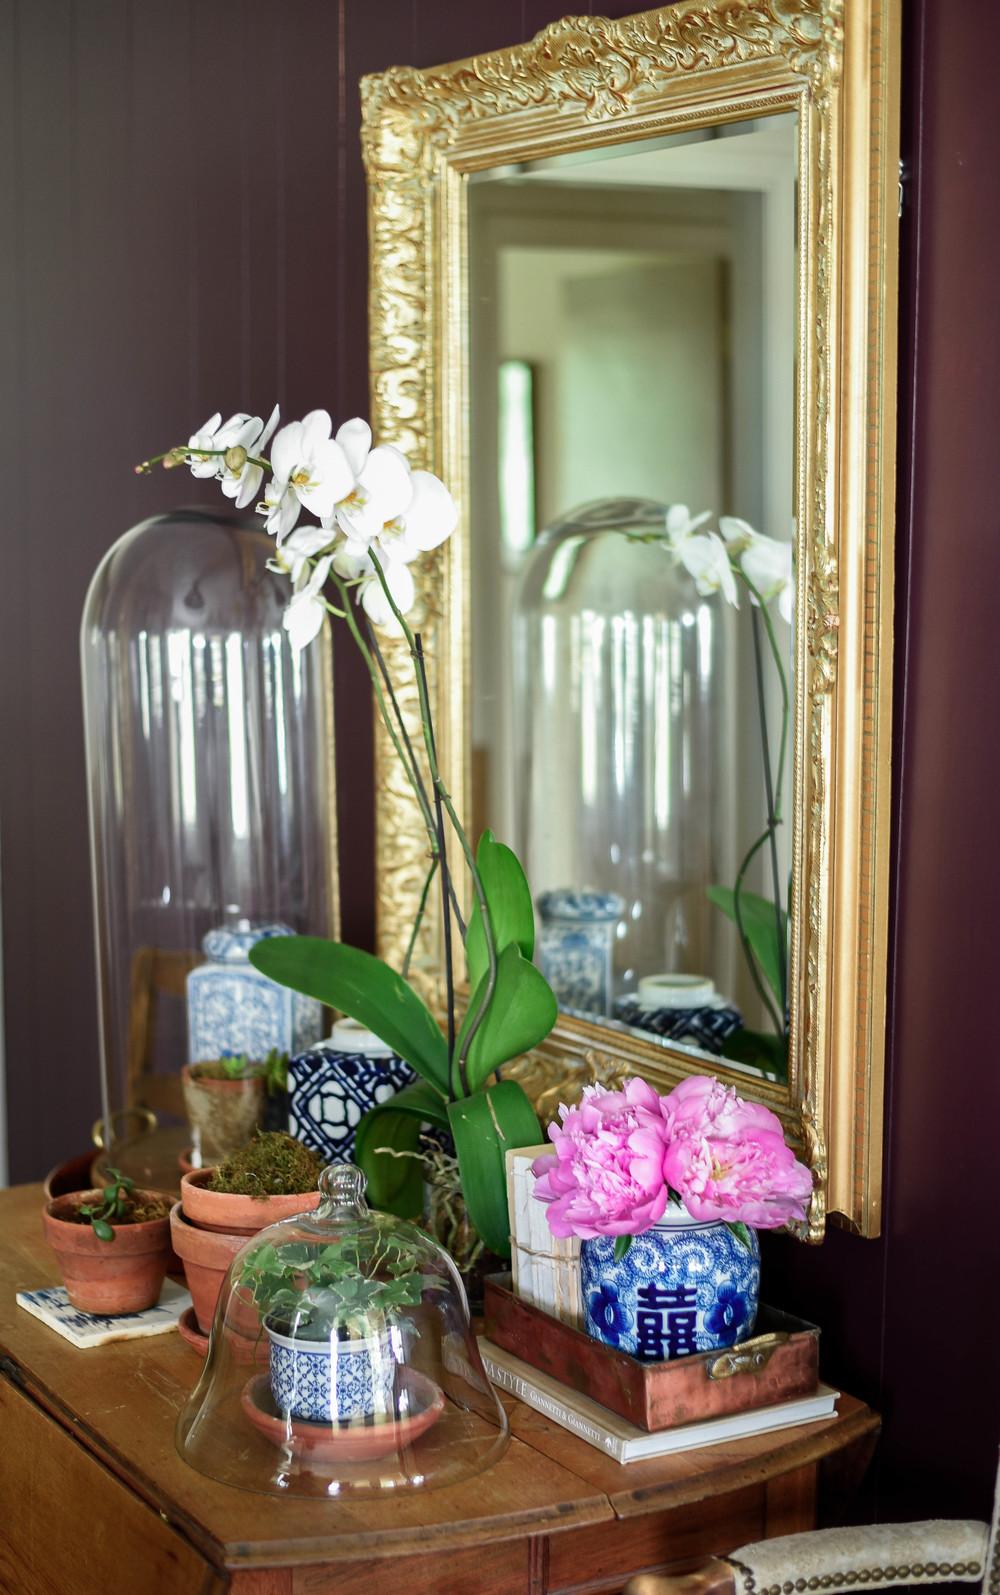 Blue & white porcelain entryway & gold gilt mirror | boxwoodavenue.com | Rachel l'antigua photography